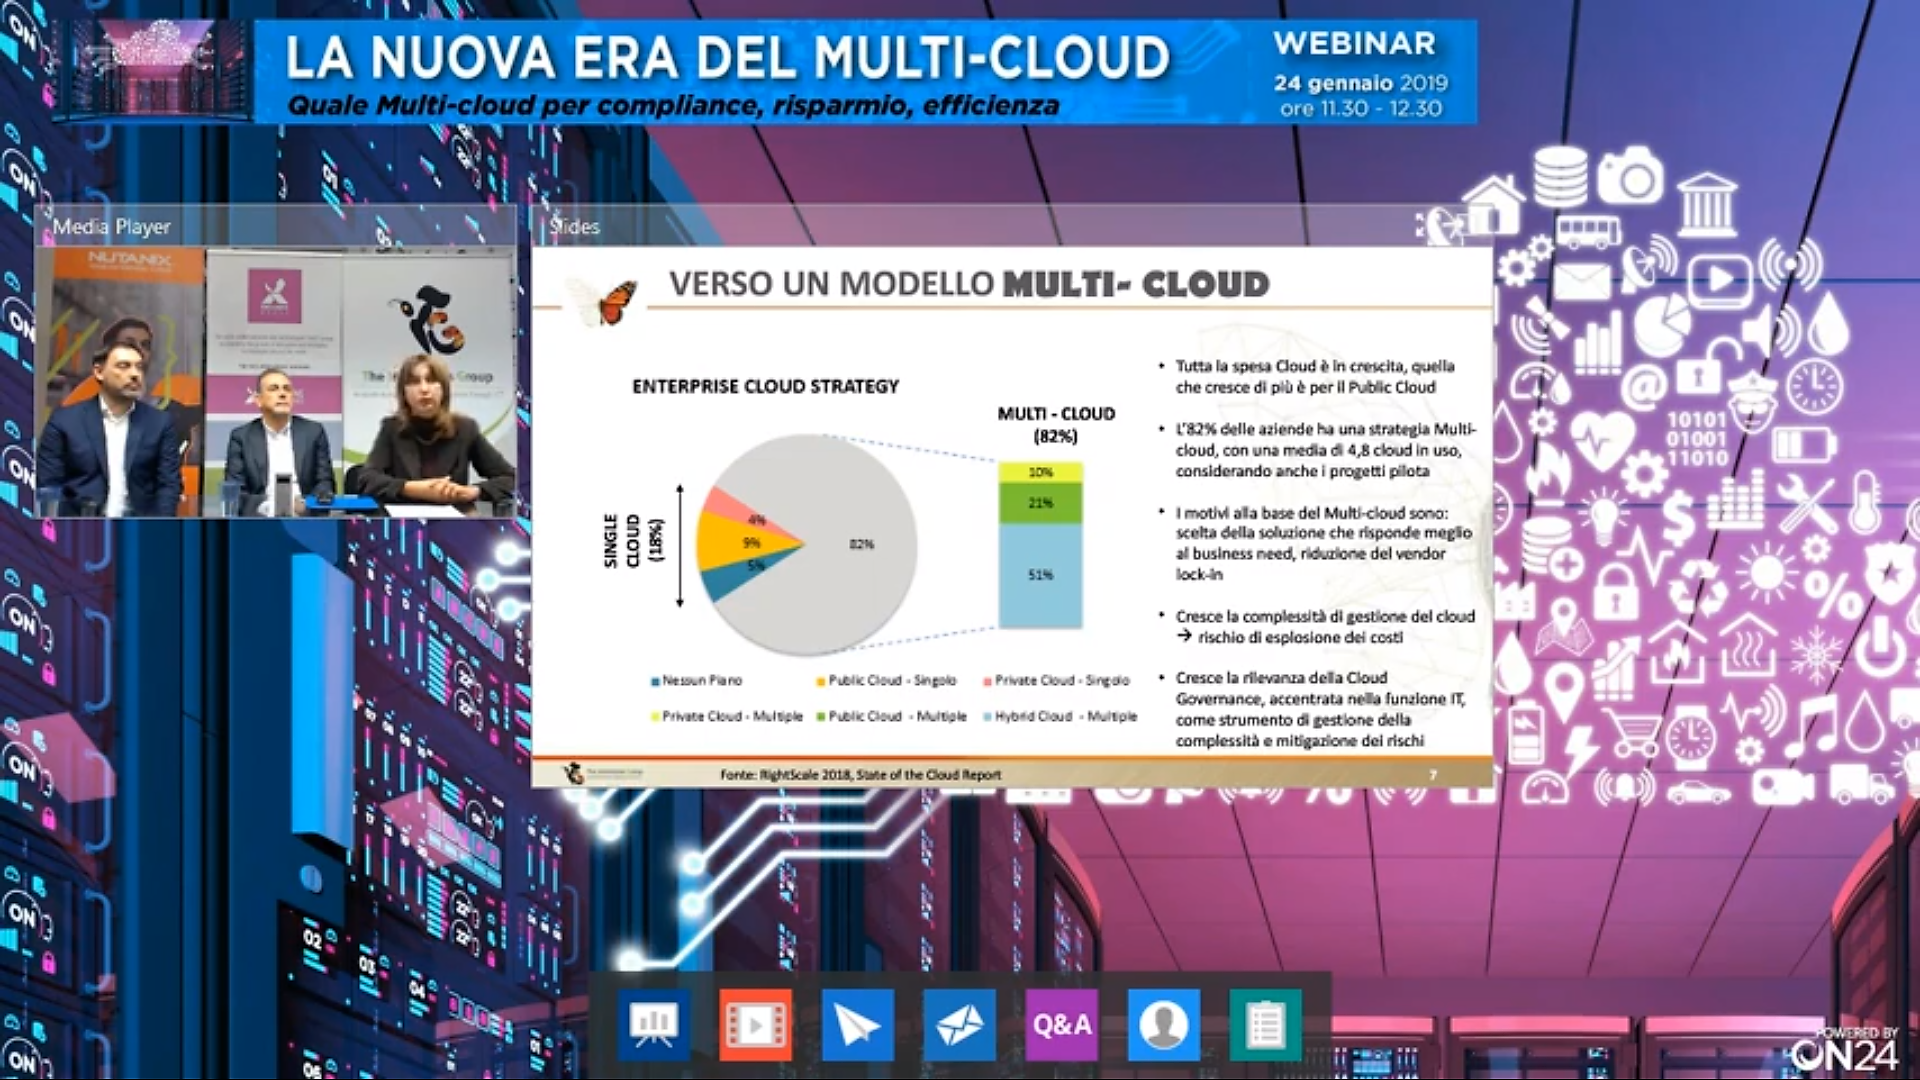 Webinar Online, la nuova Era del Multi-cloud